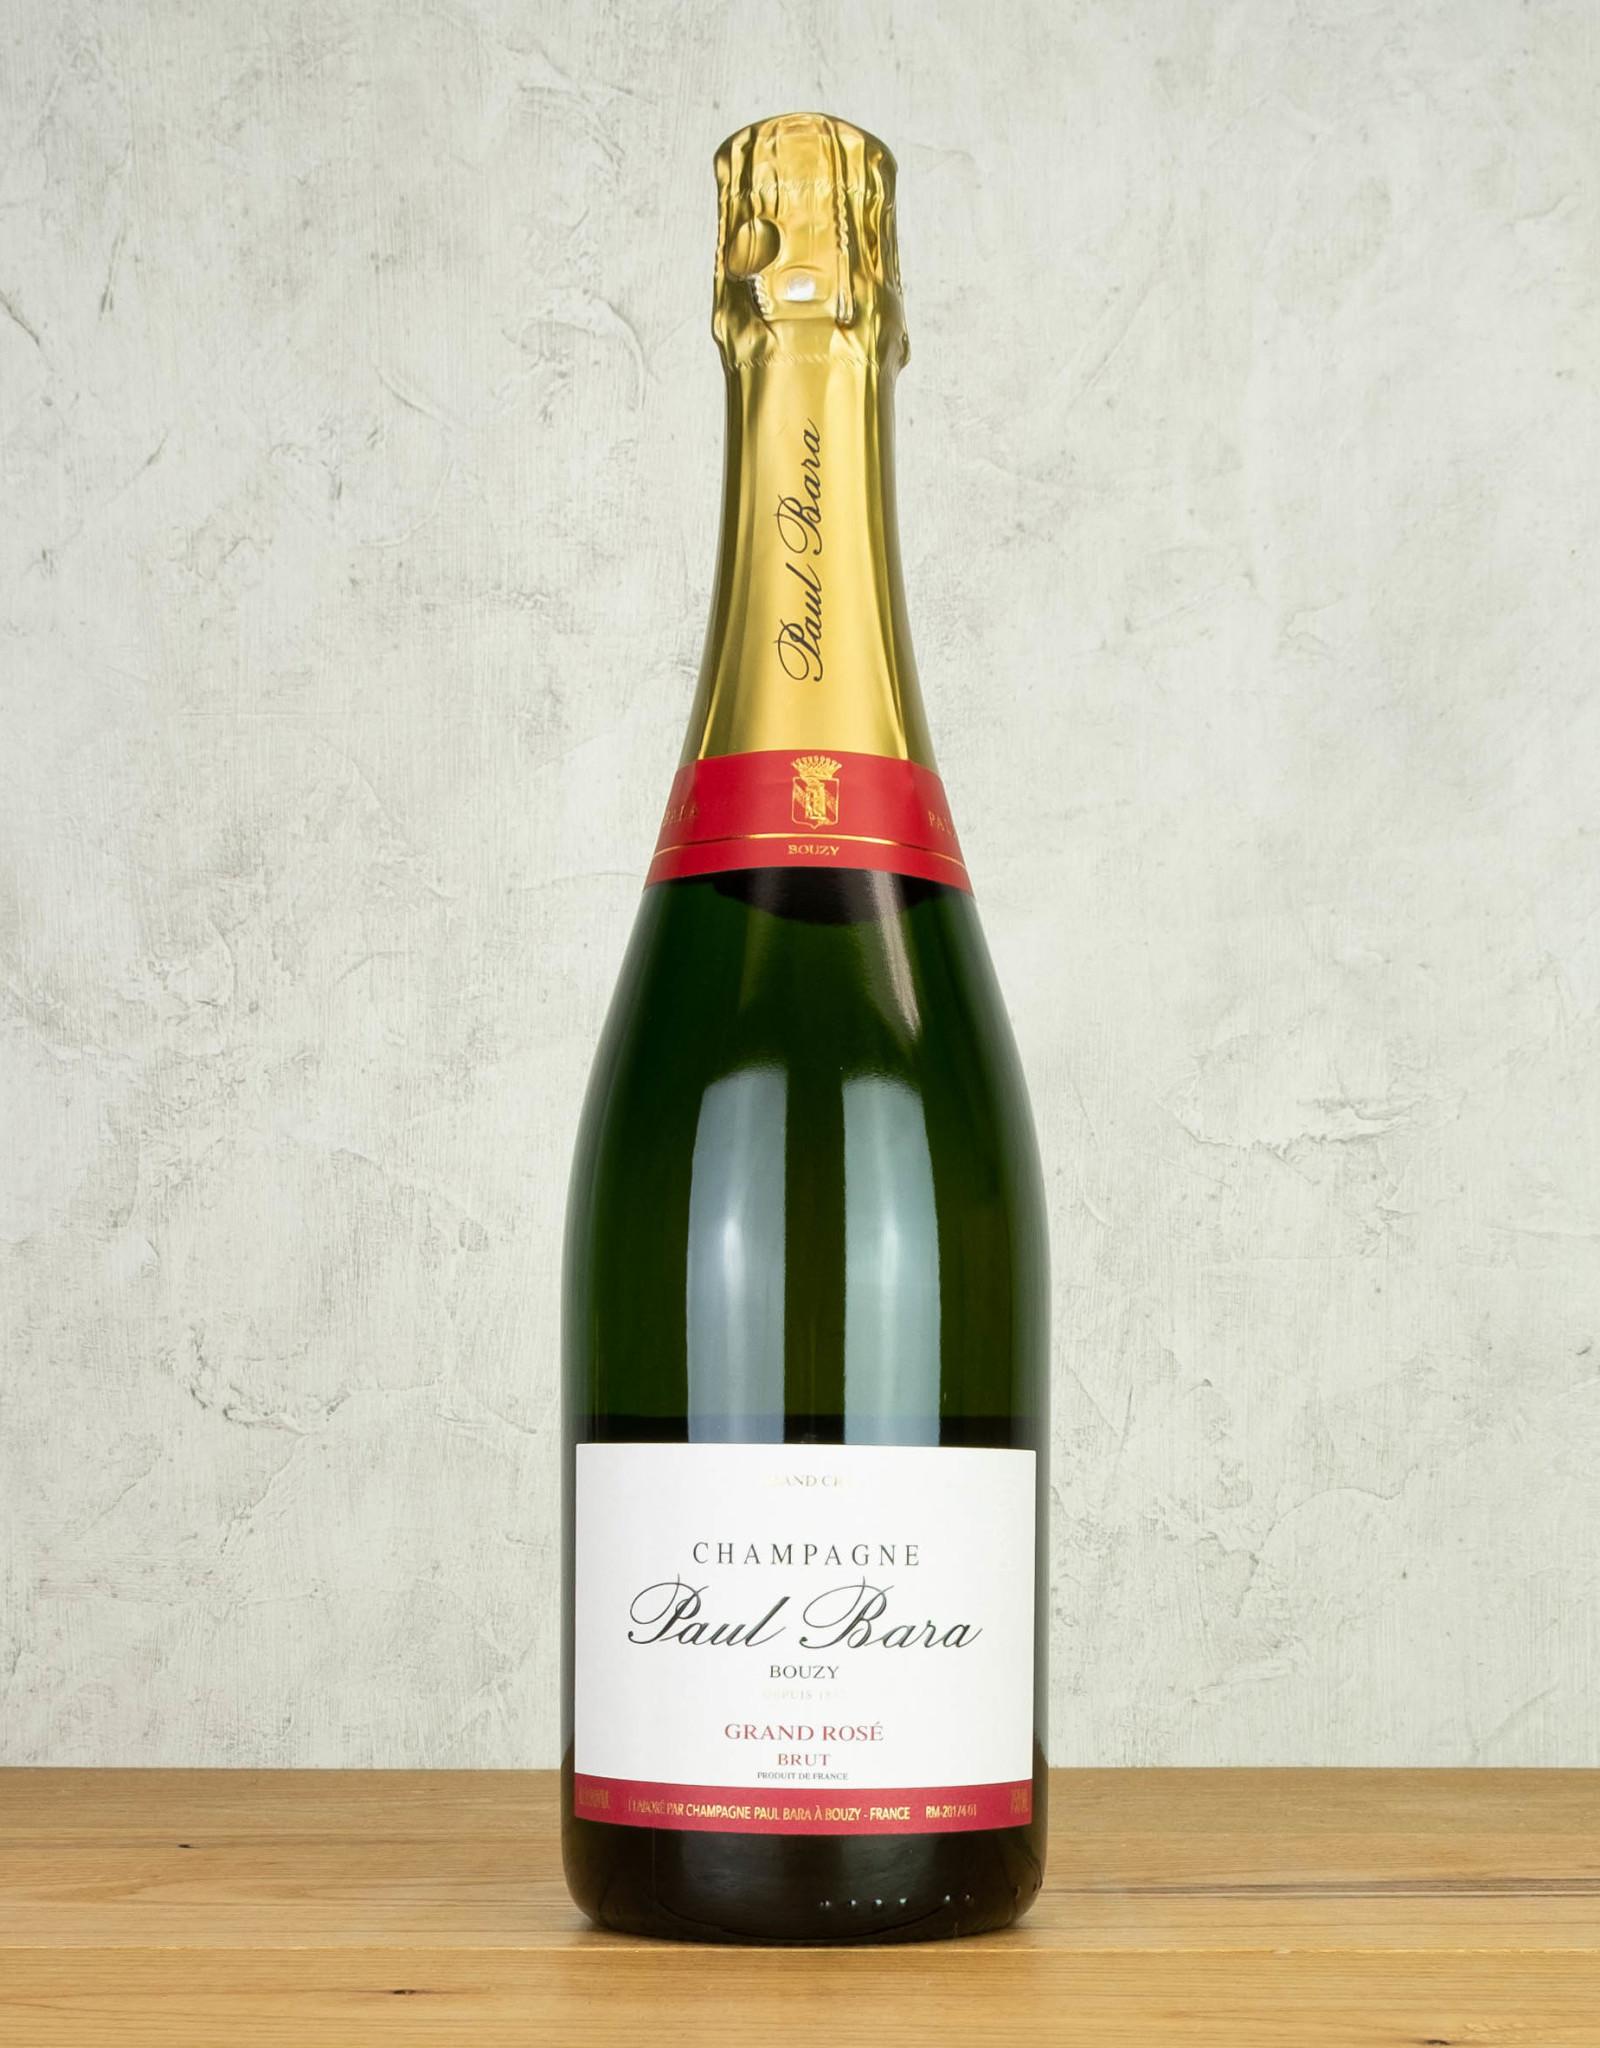 Champagne Paul Bara Grand Rose